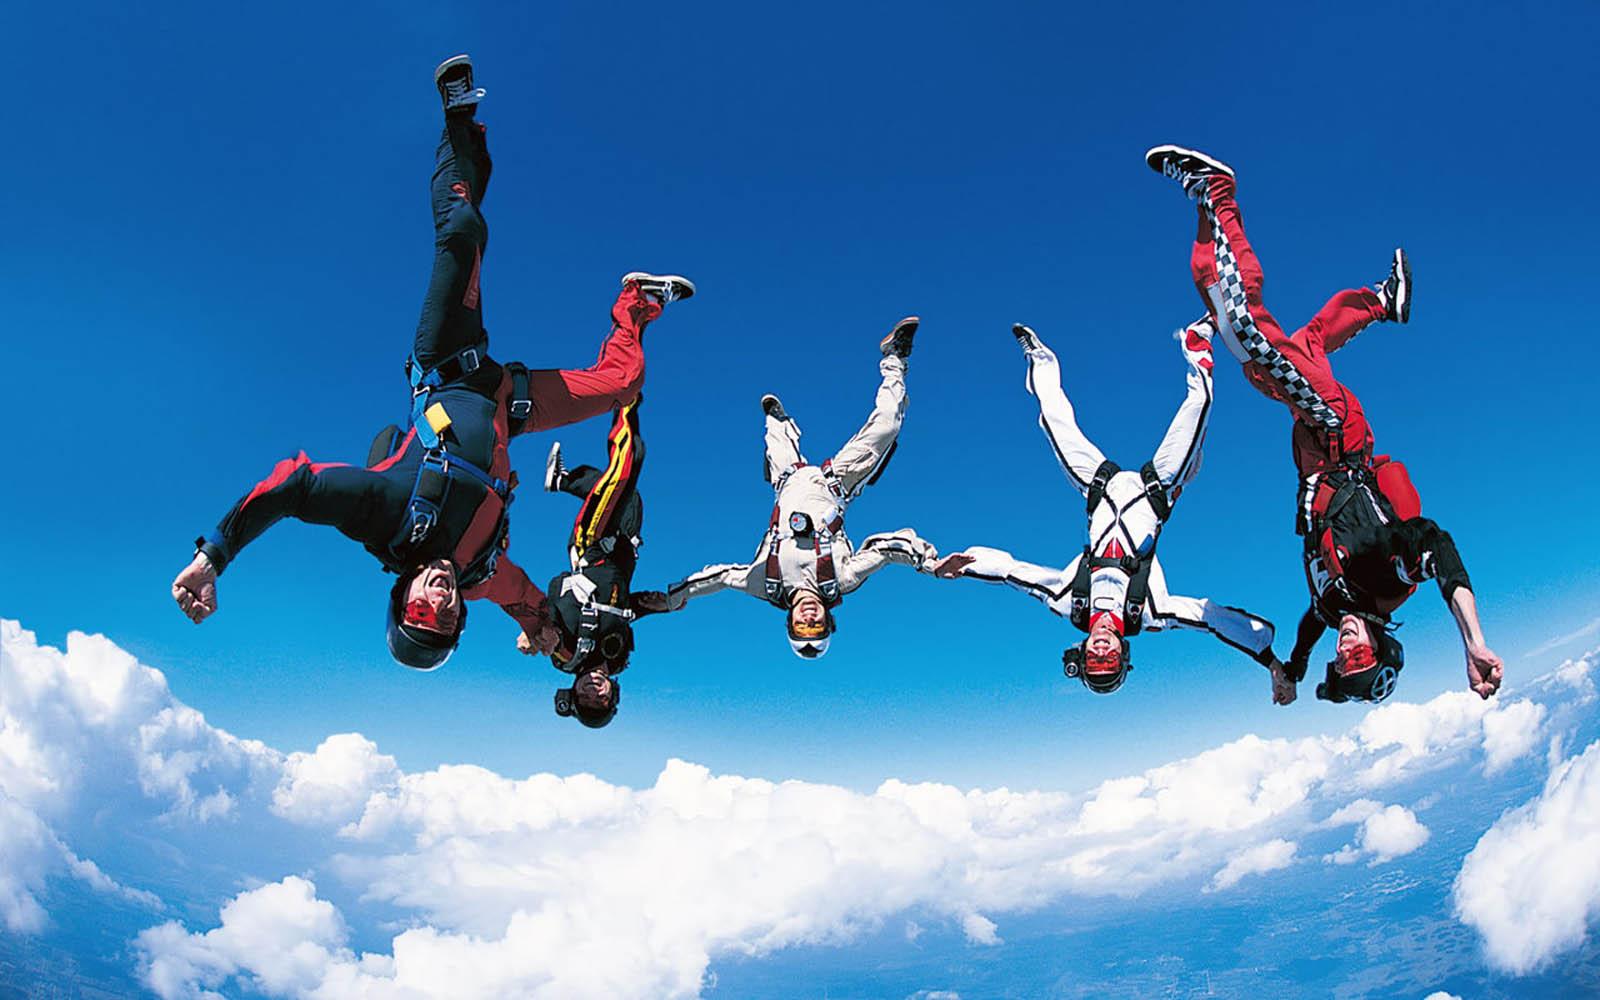 http://1.bp.blogspot.com/-CsULoiFNCVw/UD5Lh1JpoXI/AAAAAAAAIk0/3zZVnmgICQI/s1600/Skydiving%20Wallpapers%206.jpg